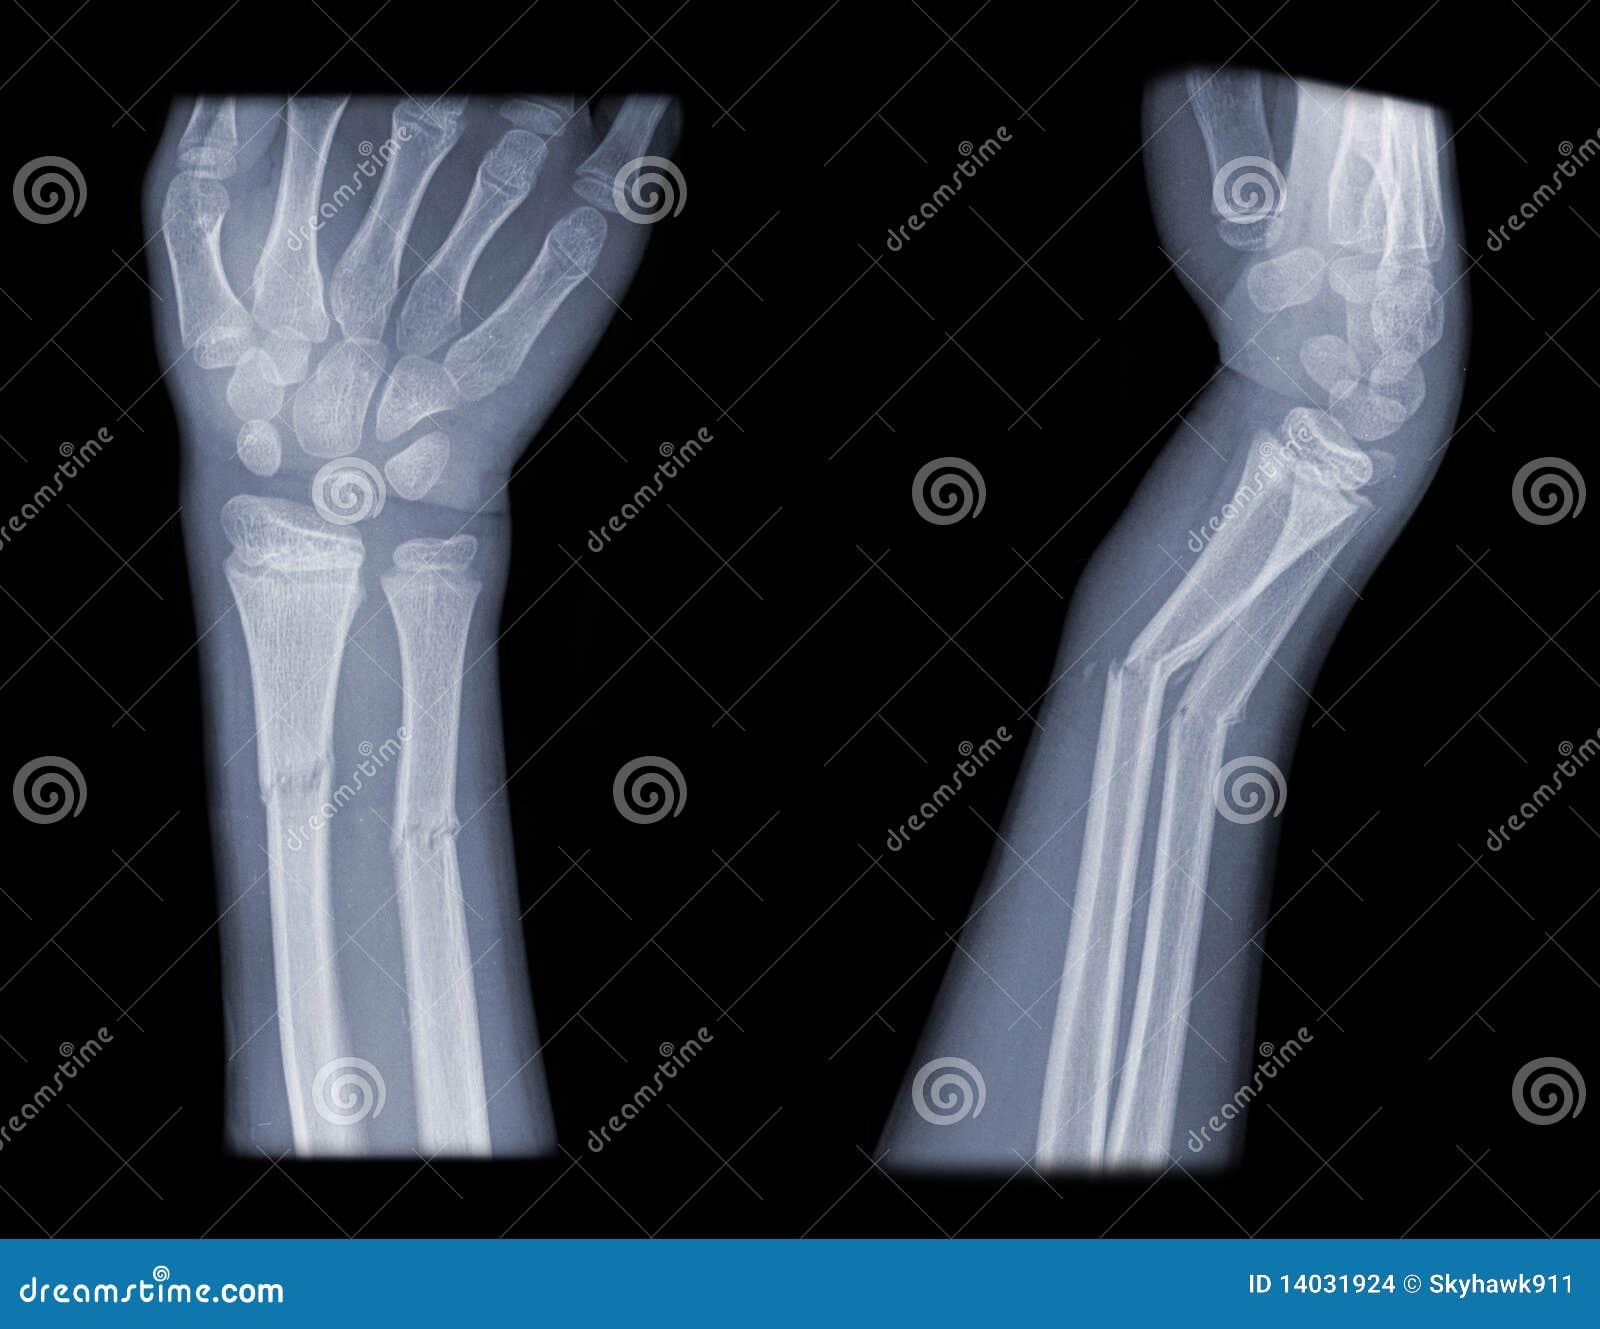 Distal arm fracture